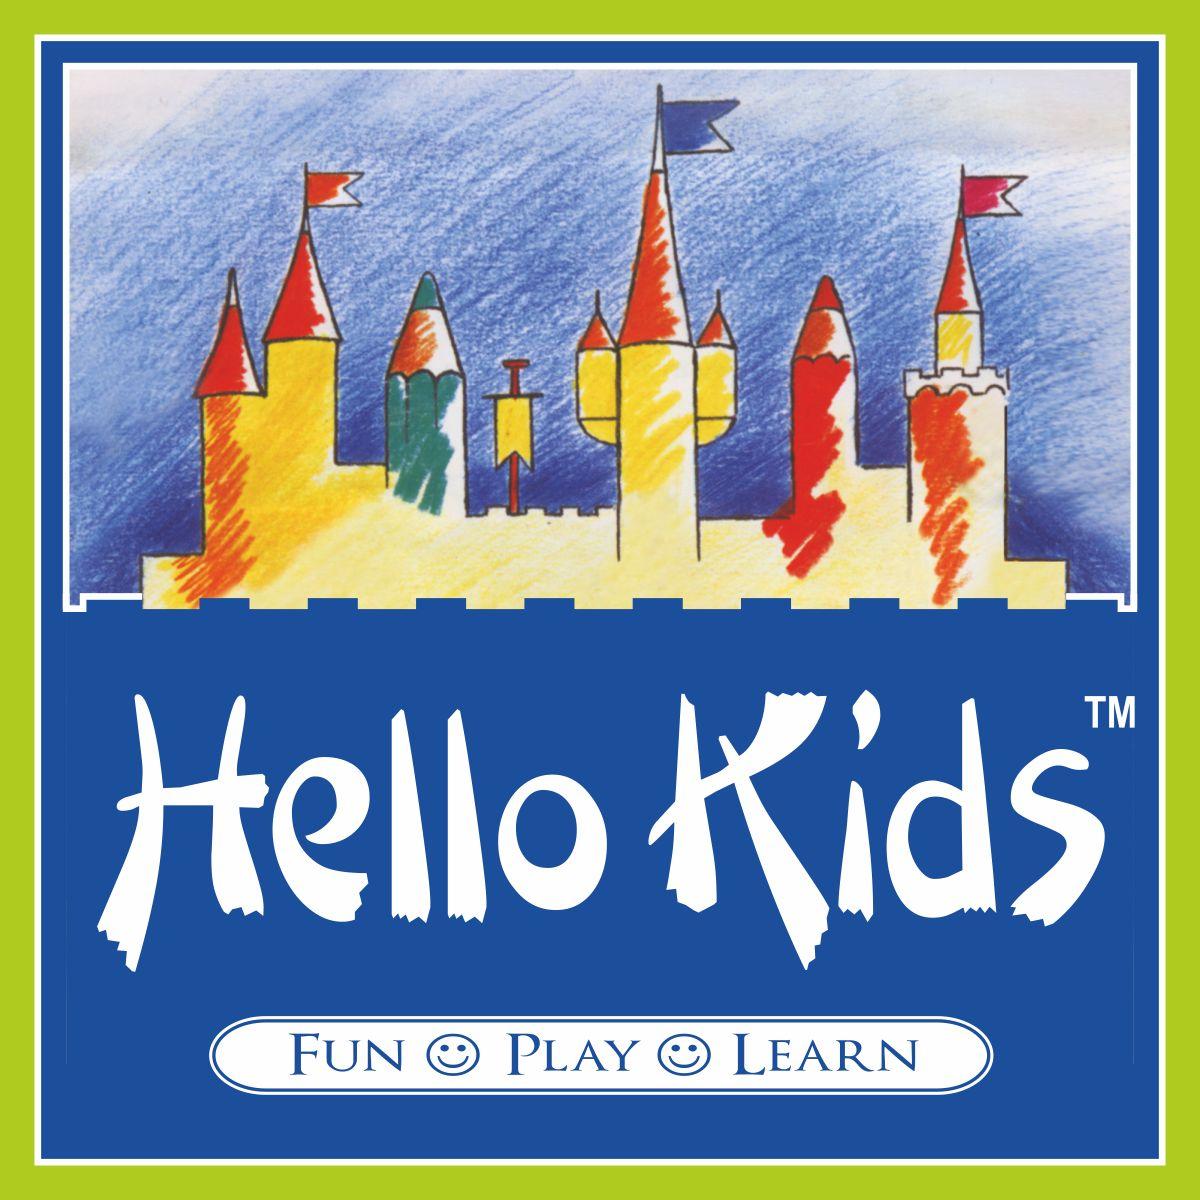 Hello Kids - Navi Mumbai Image